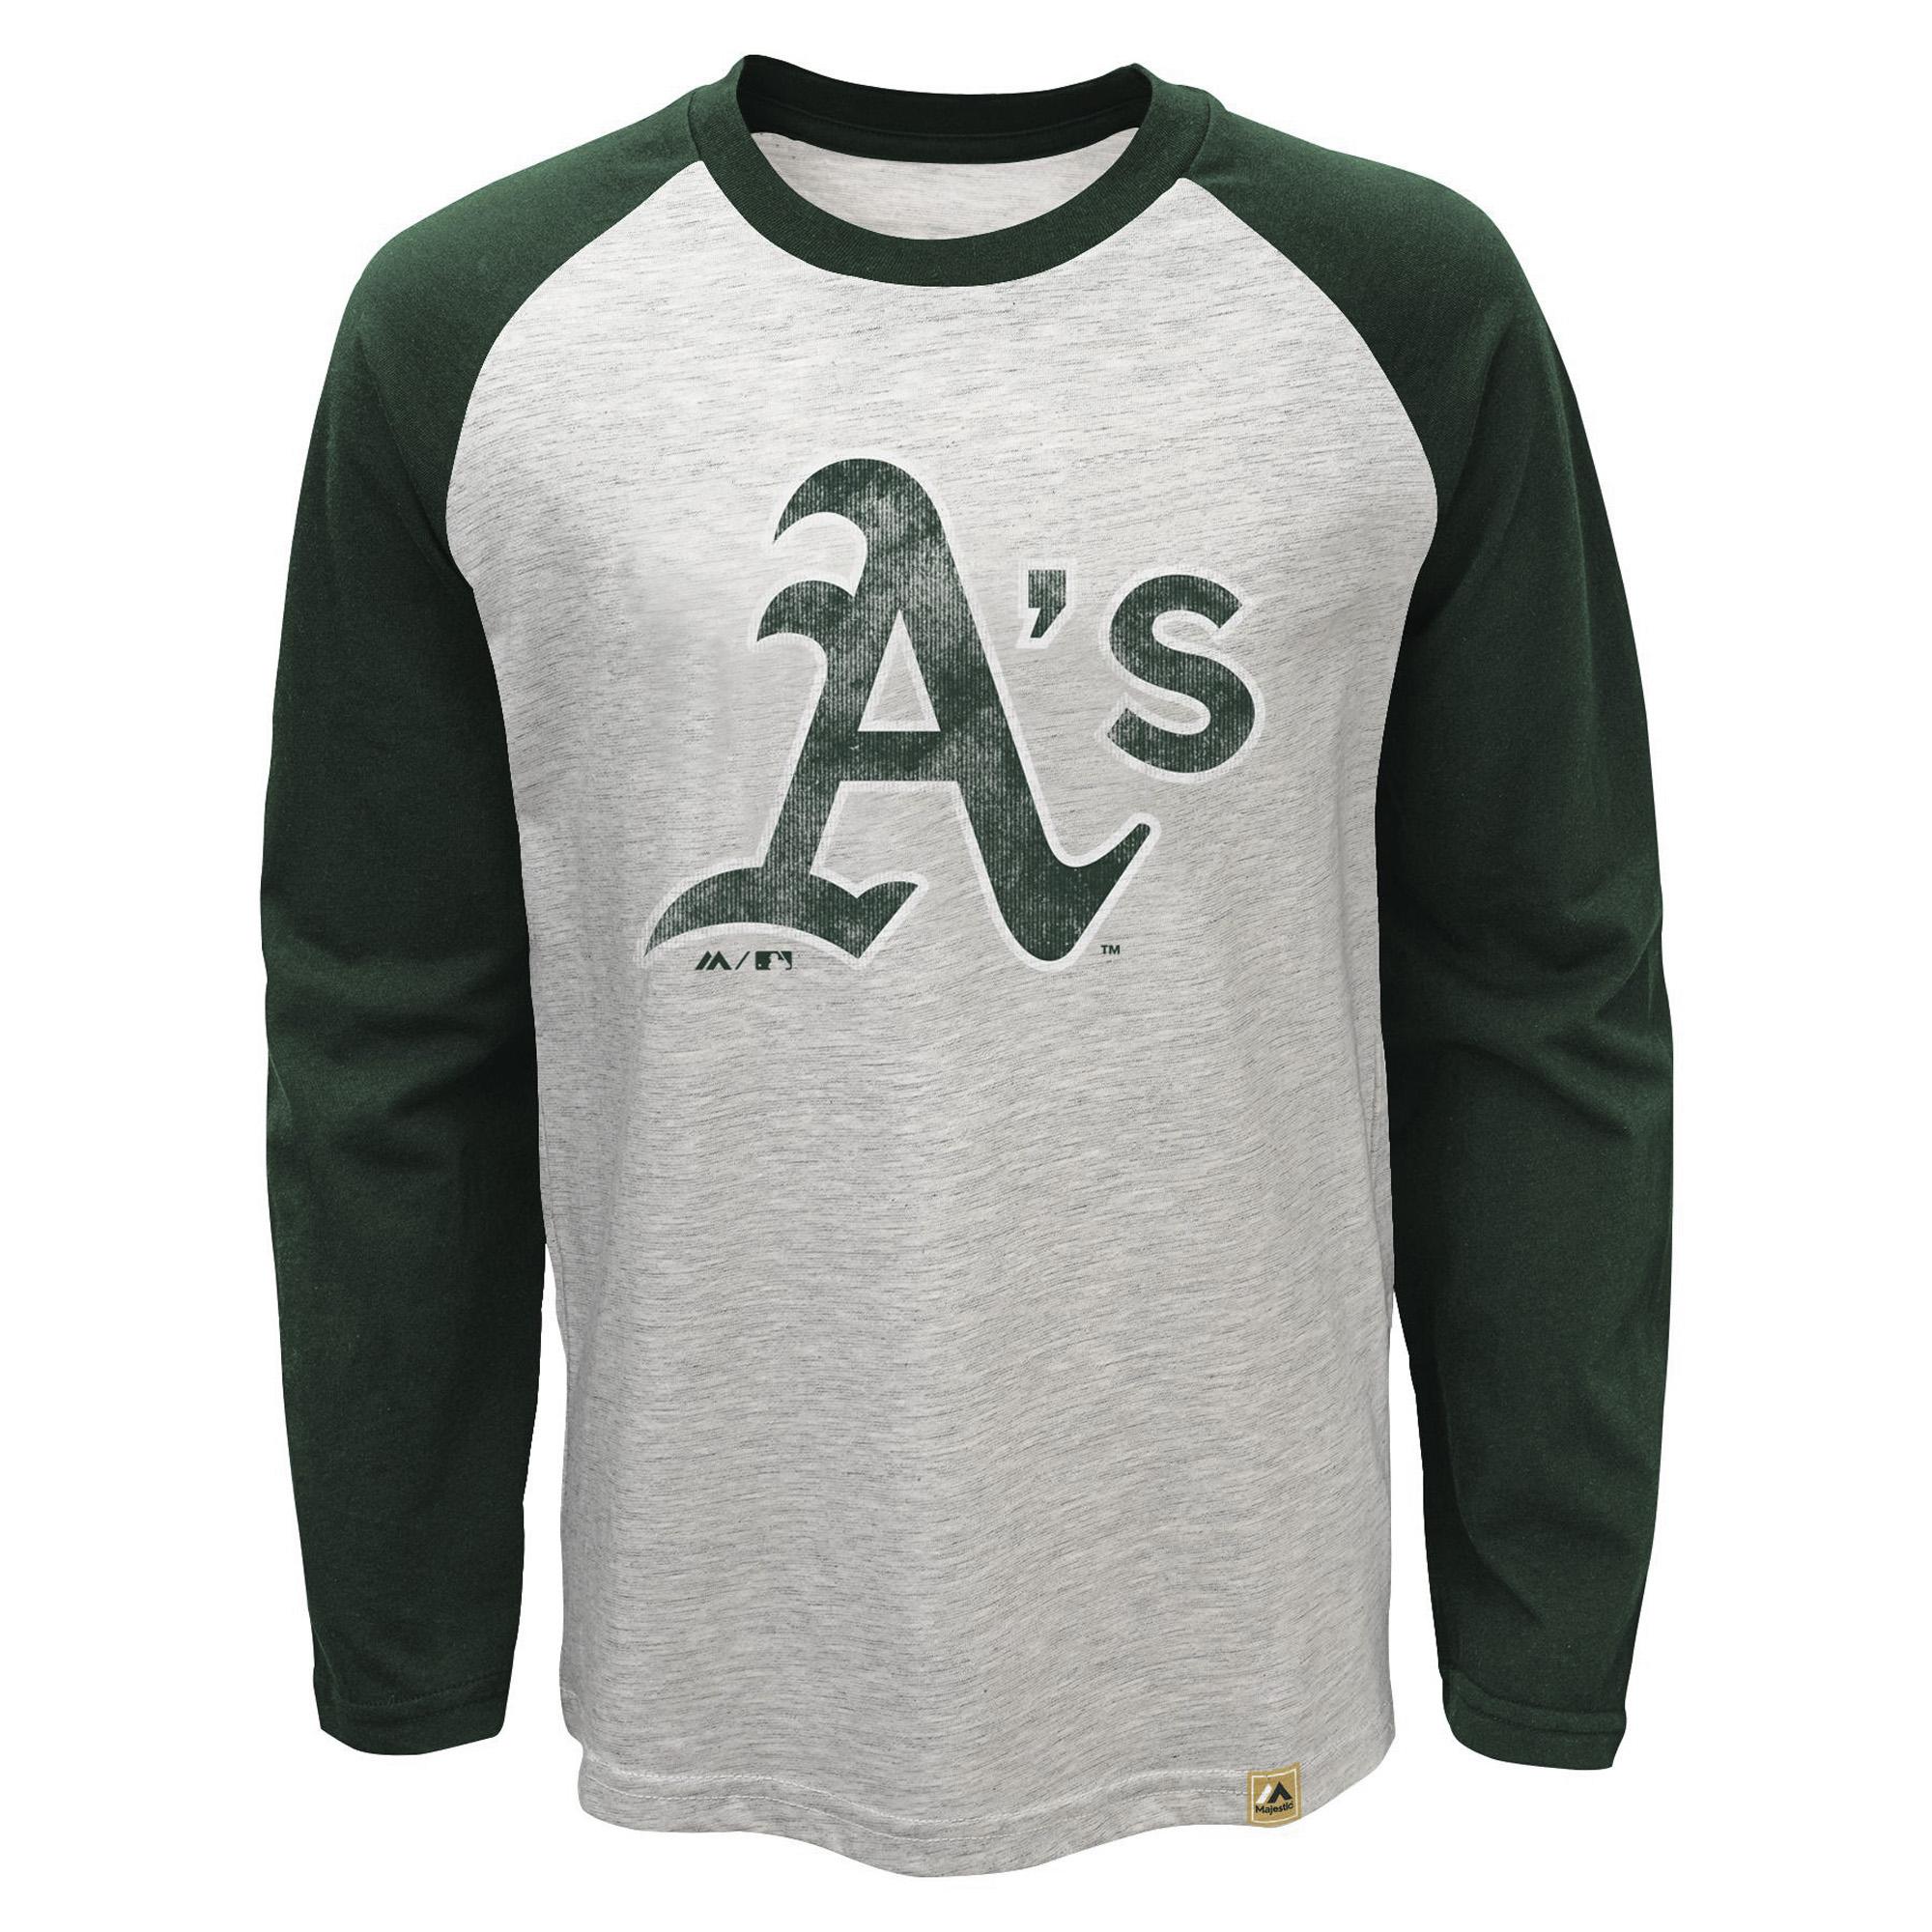 Oakland Athletics Majestic Youth American Baseball Long Sleeve Raglan T-Shirt - Cream/Green